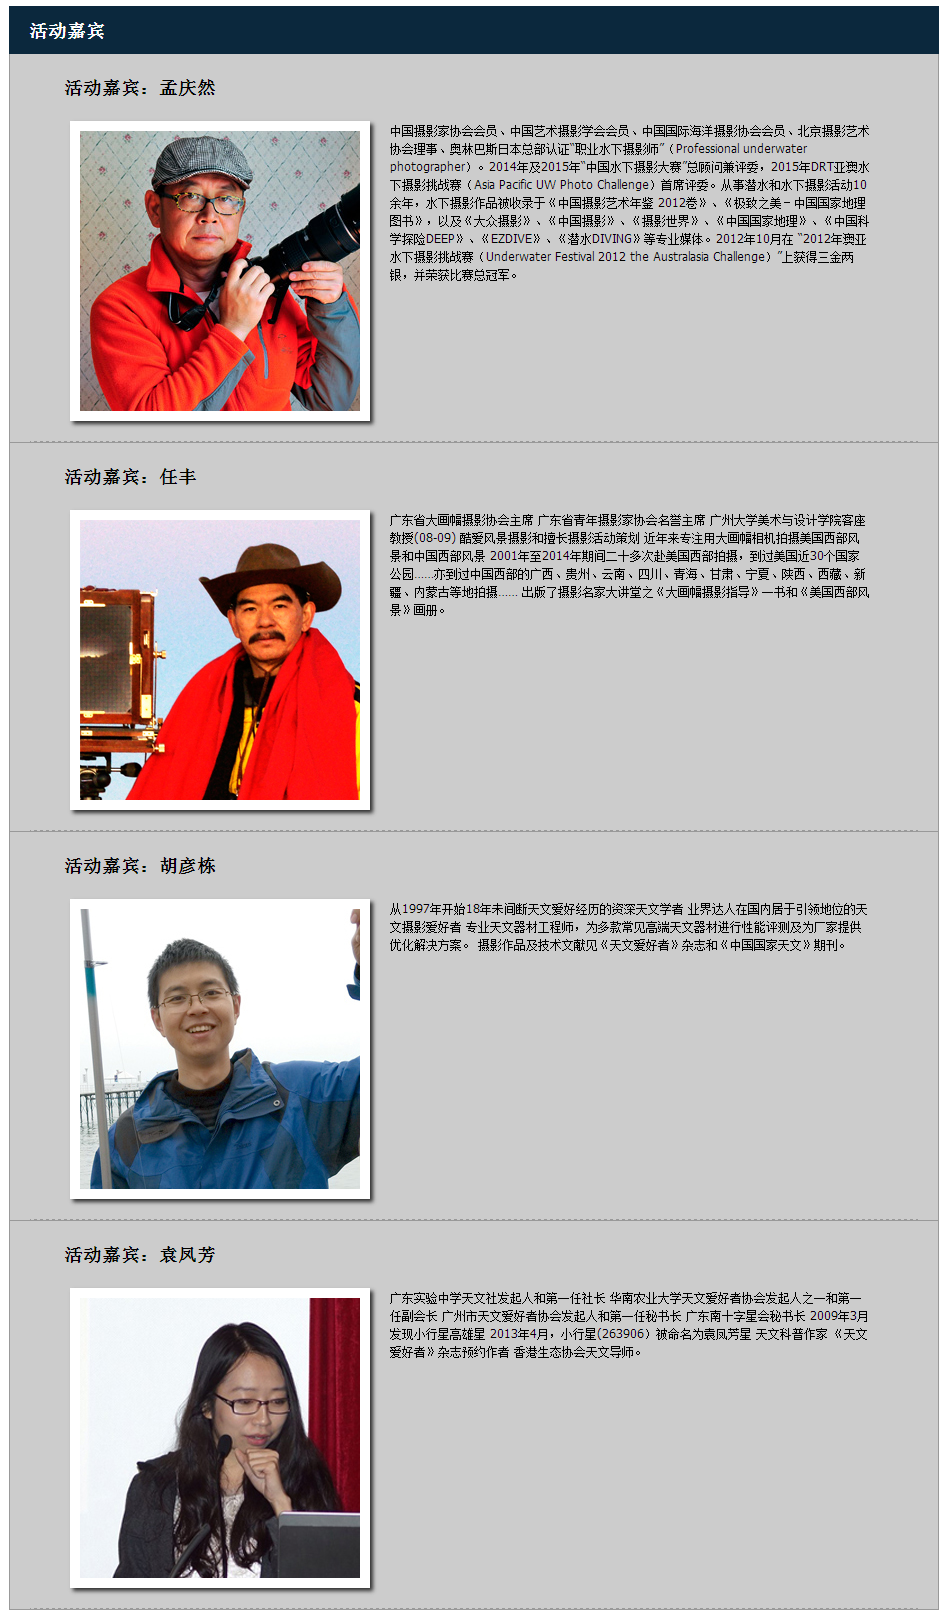 OLYMPUS 产品体验会 广州会场111.png